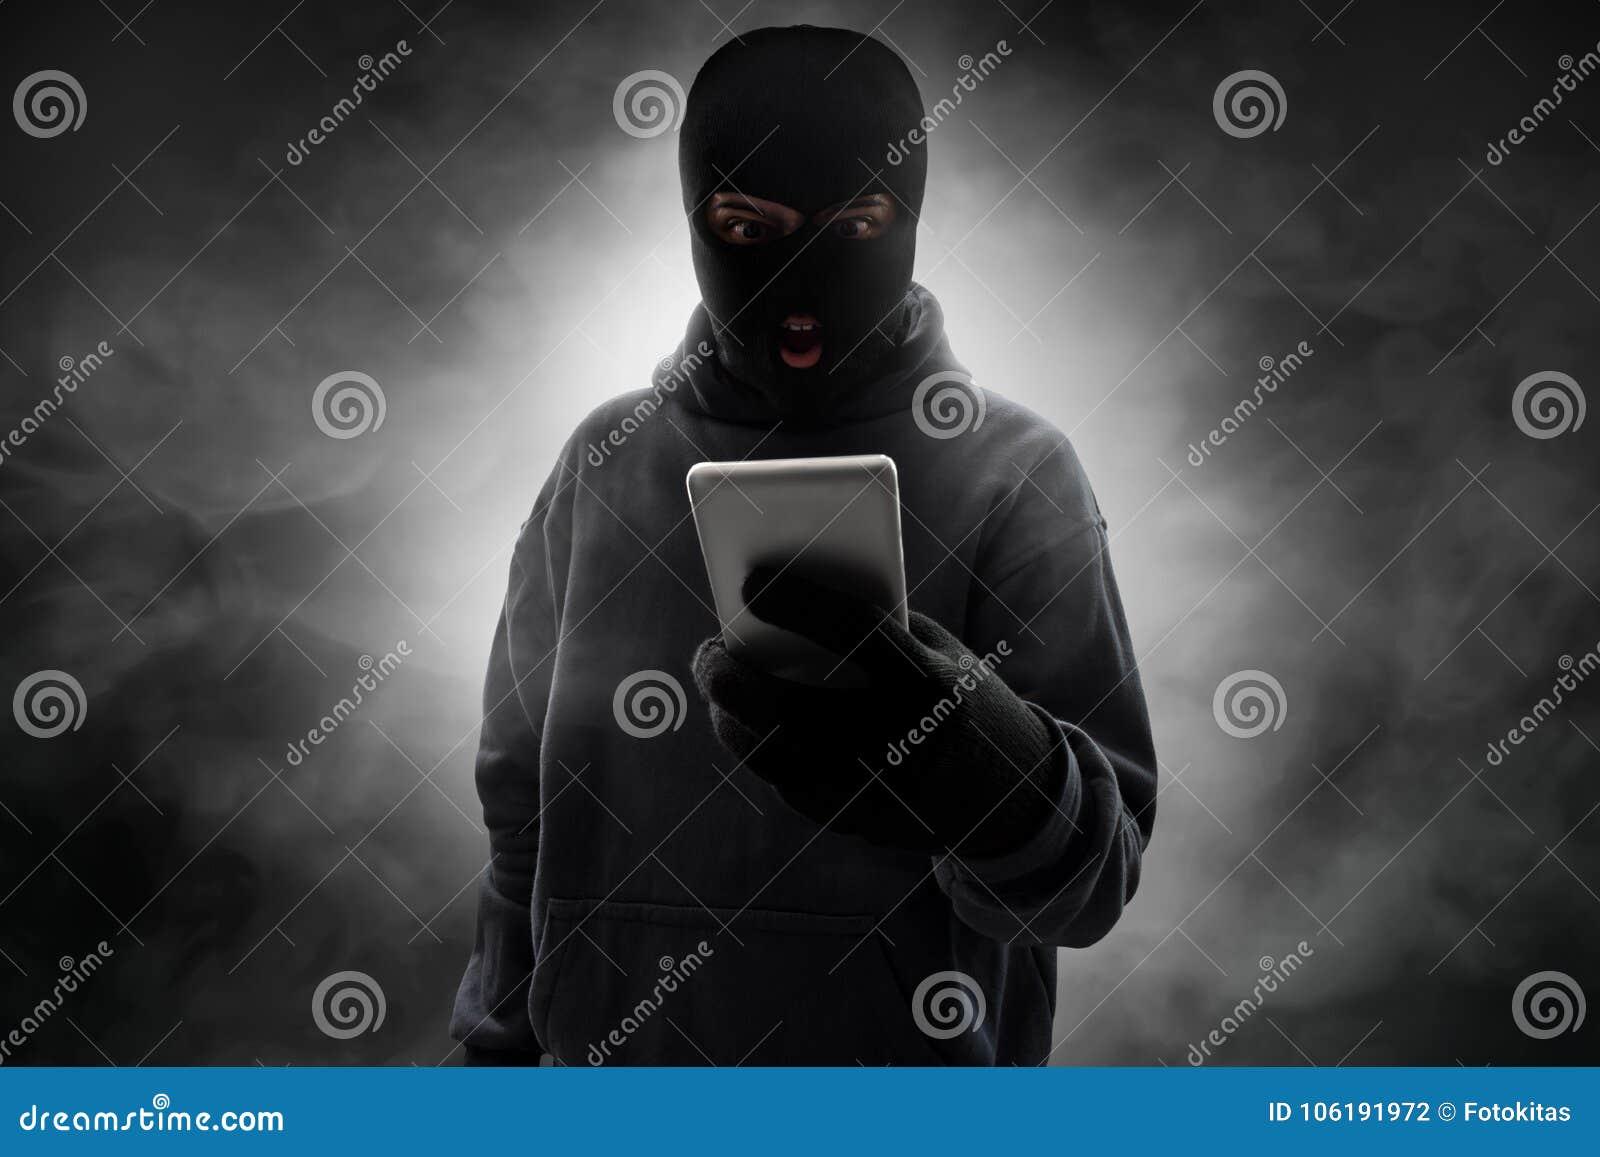 DOROTHEA: Masket Thief